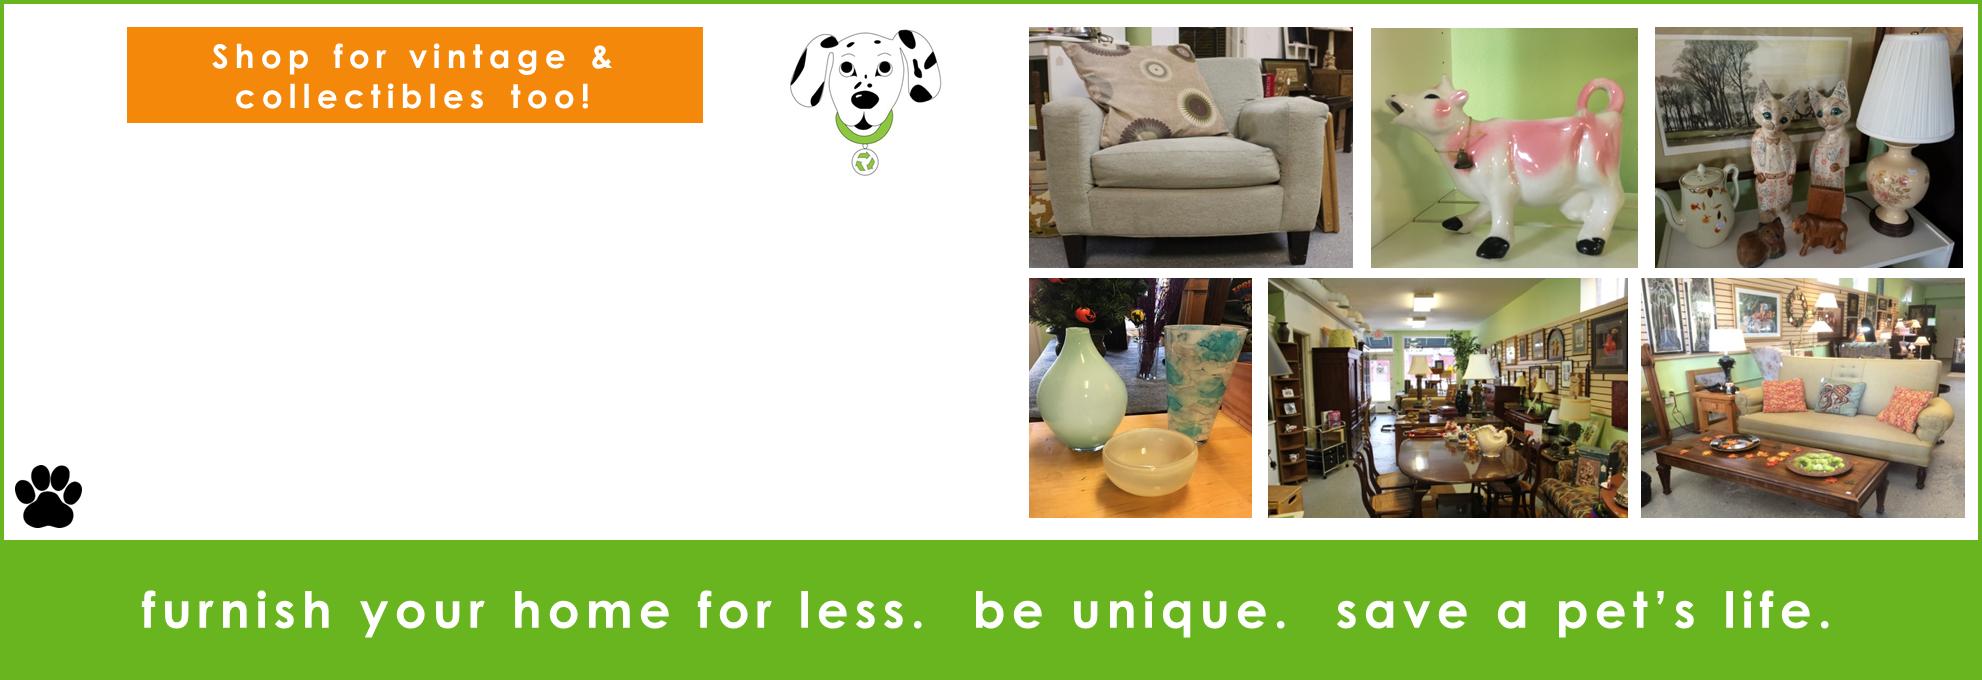 Our Furniture, Decor & More store!